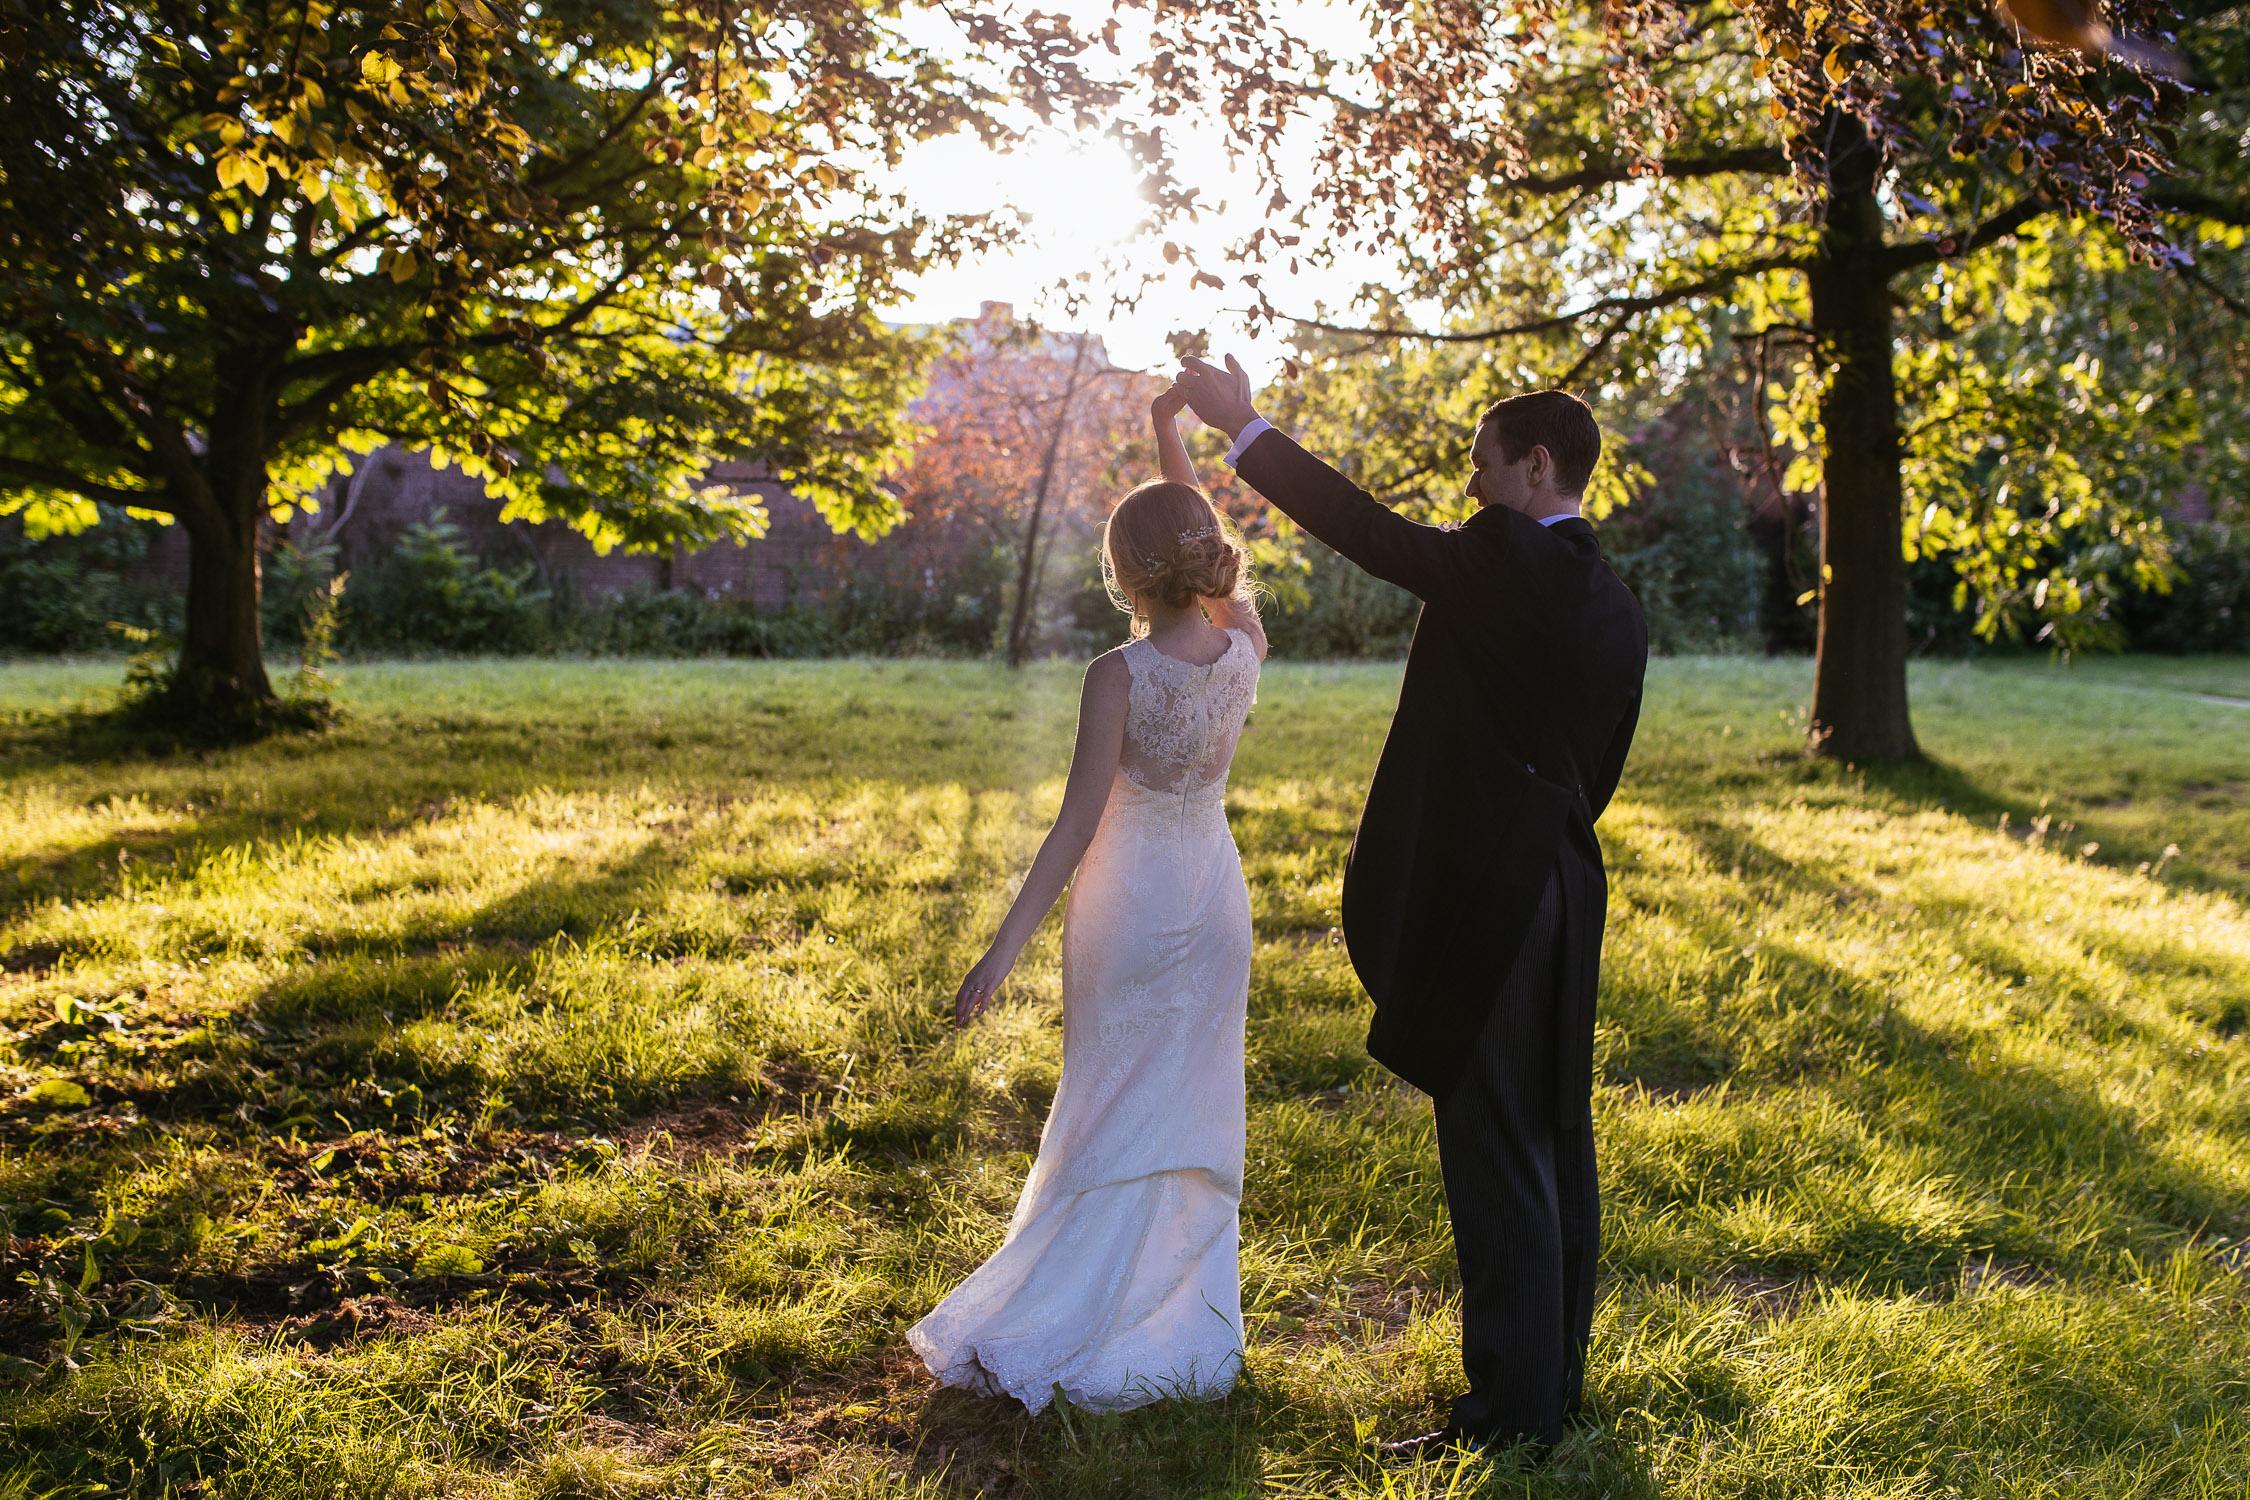 Lizi-and-Mark-Wedding-Highlights-85.jpg